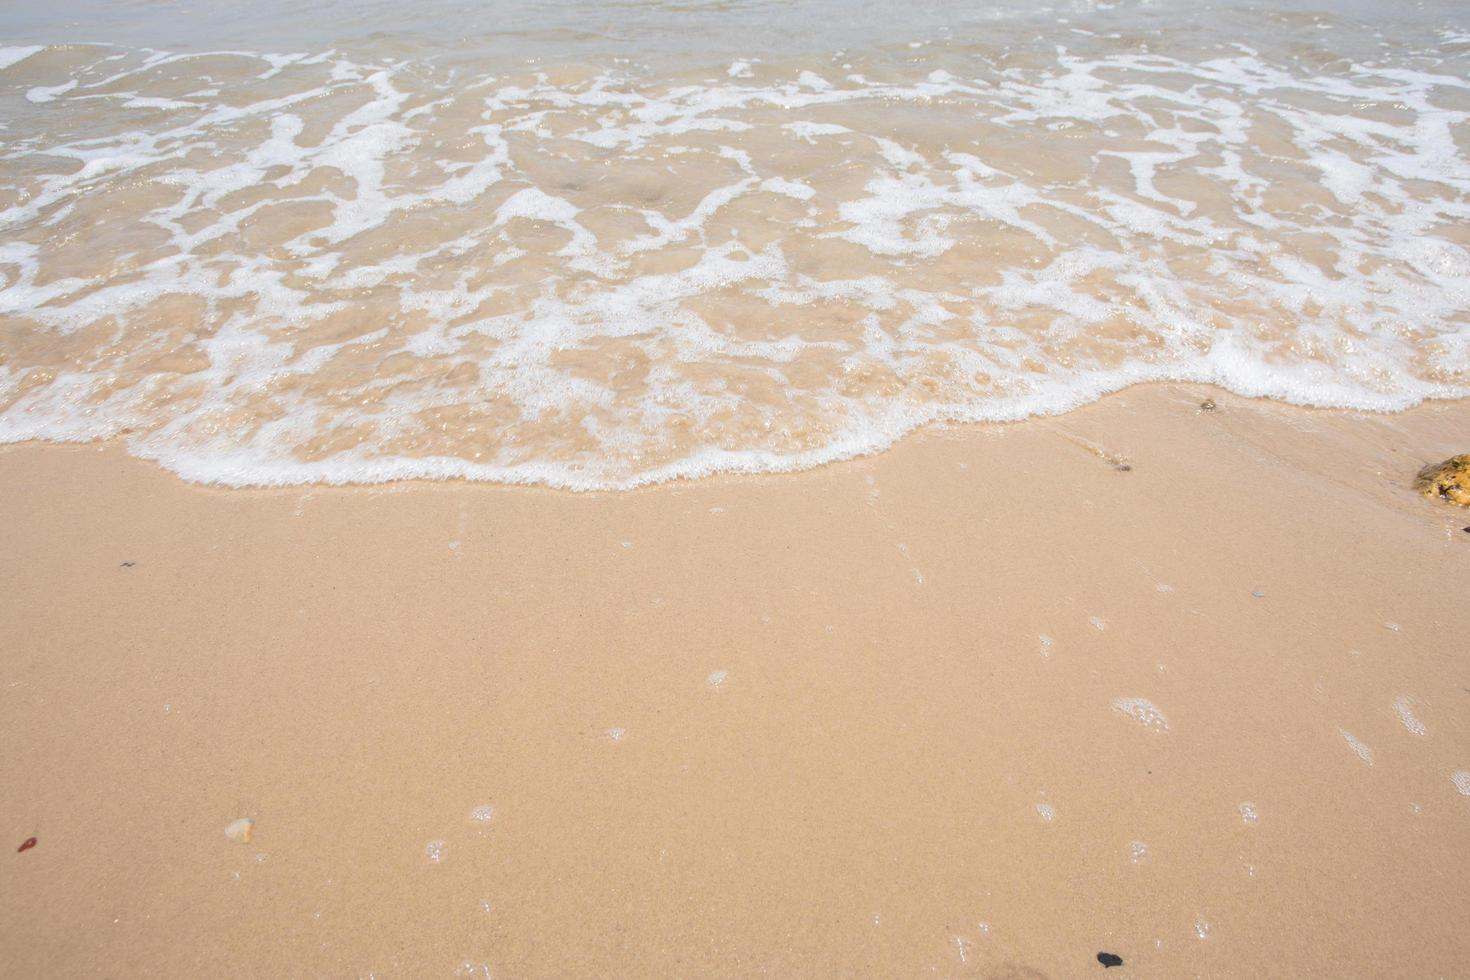 Beach sand and wave photo